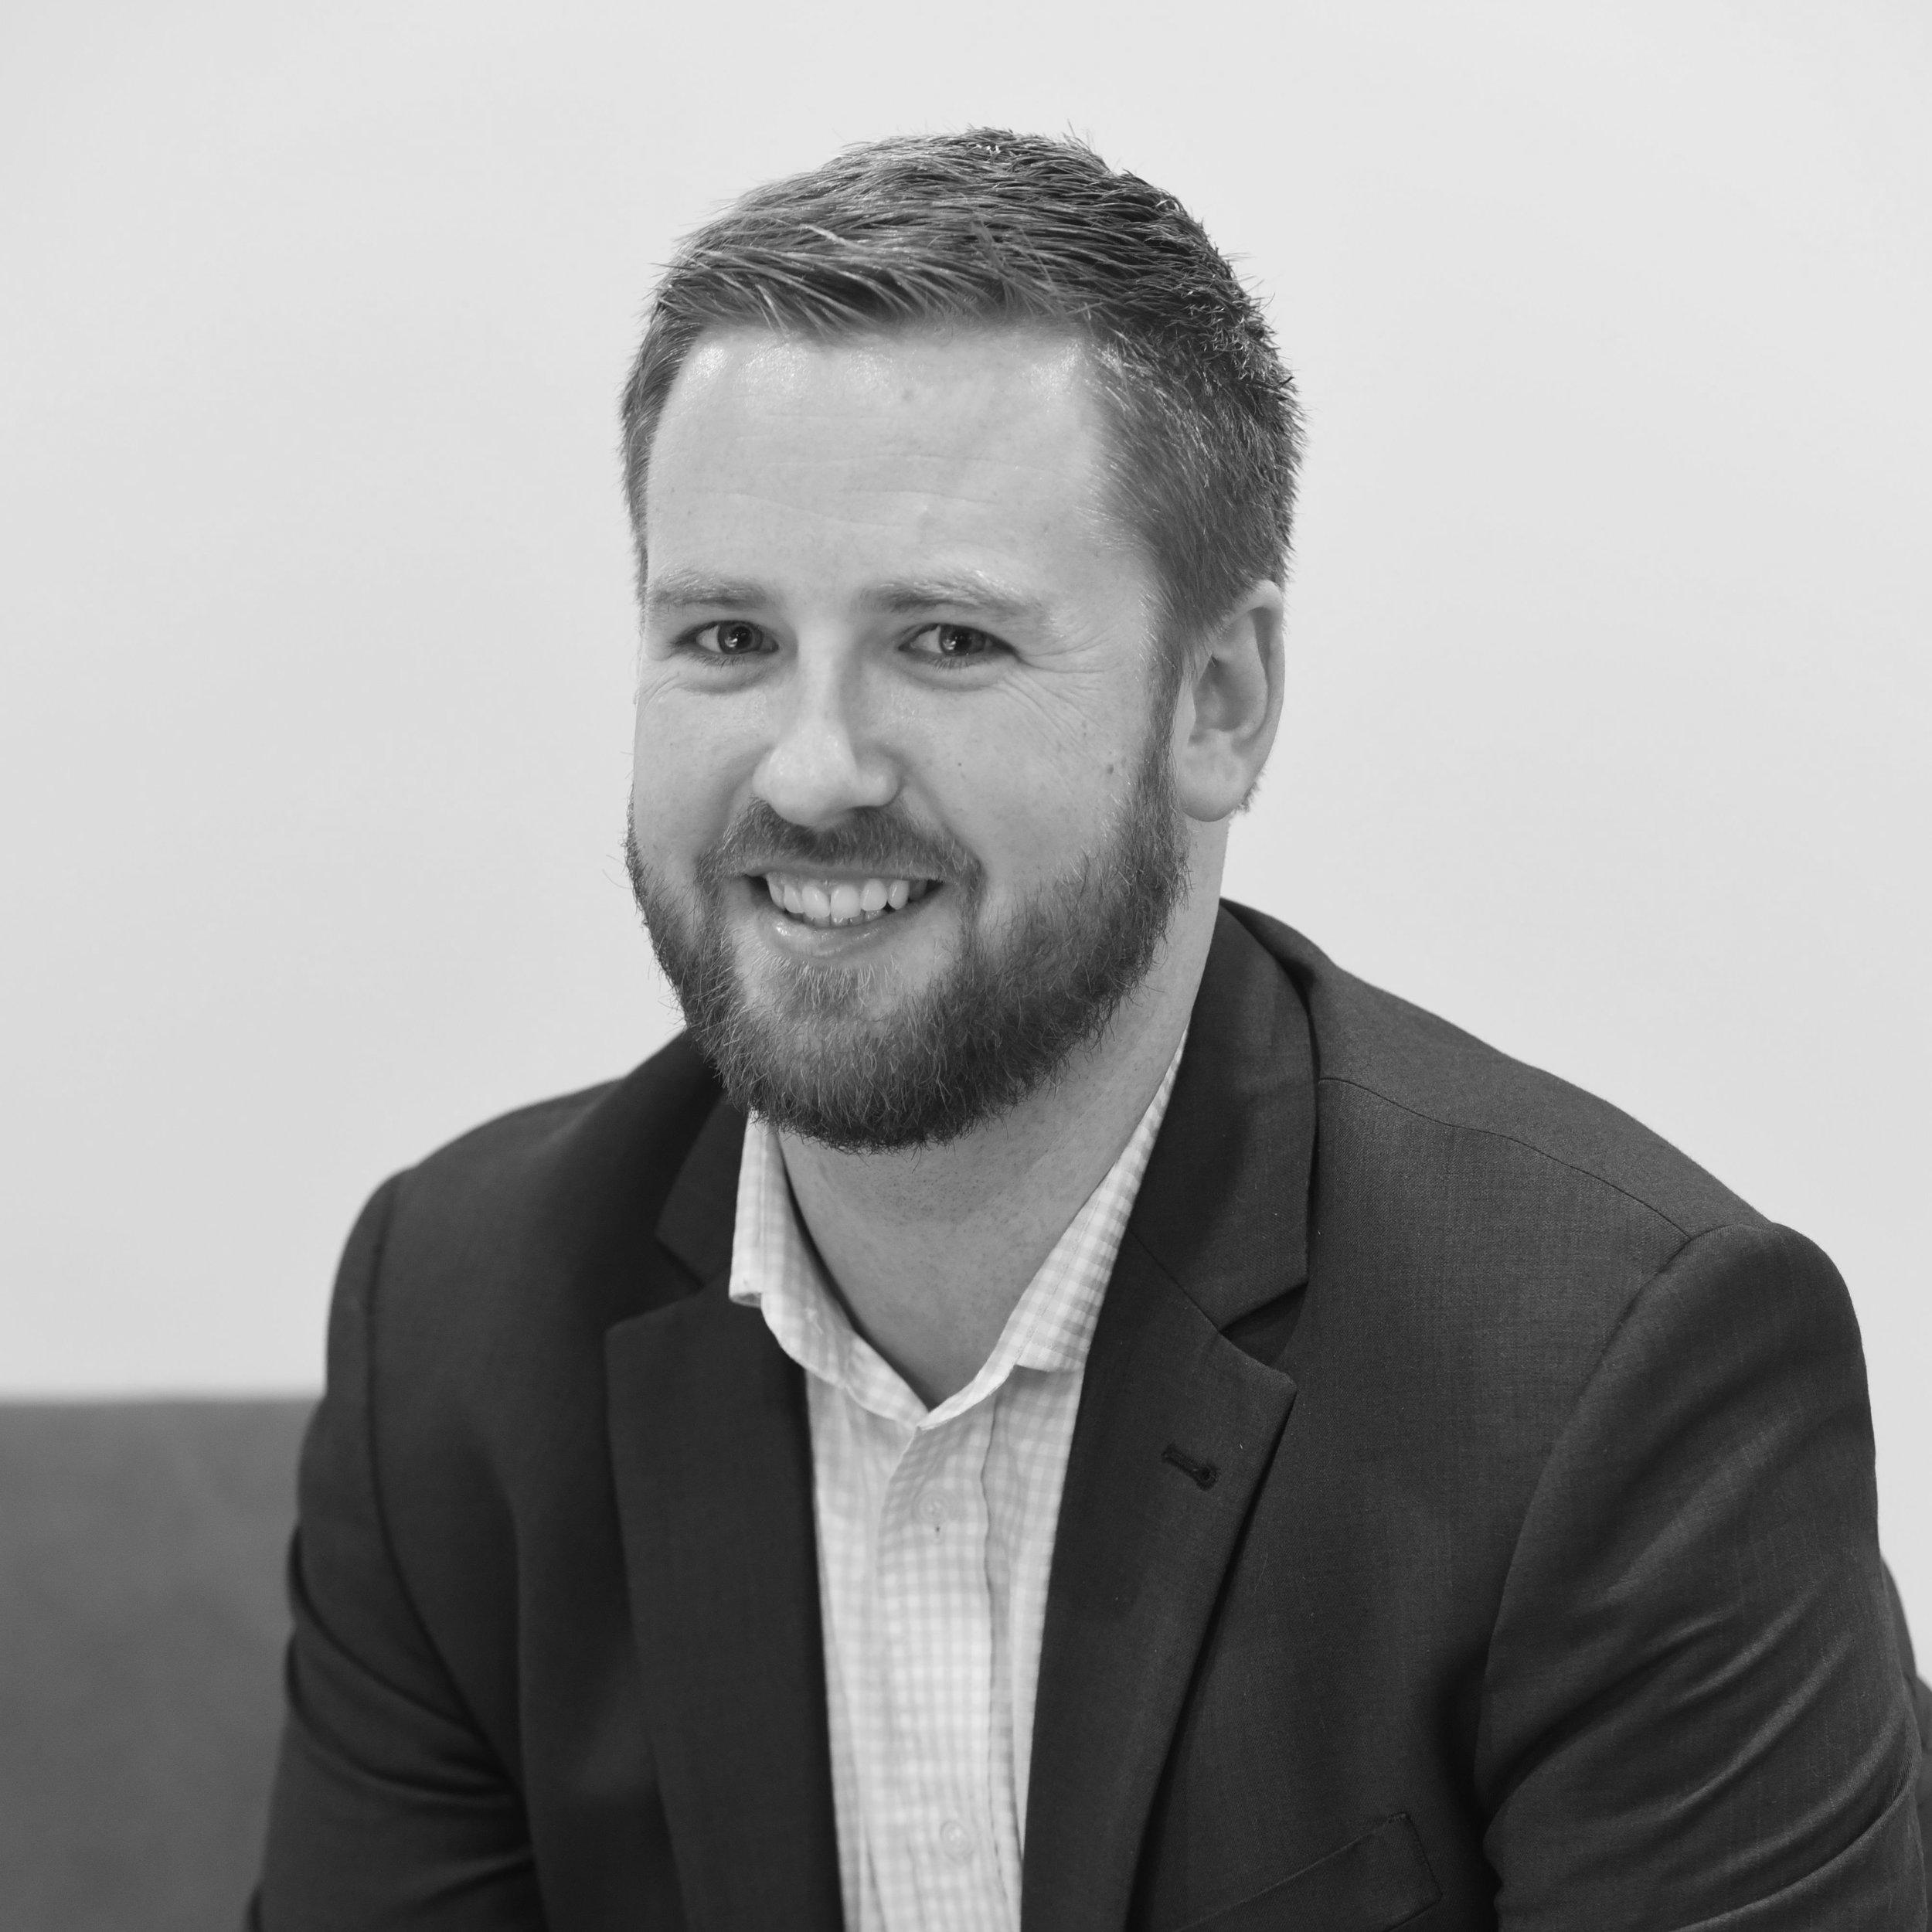 James-Swaney-Sidekick-Ashburton-Chartered-Accountant-Fixed-Fee